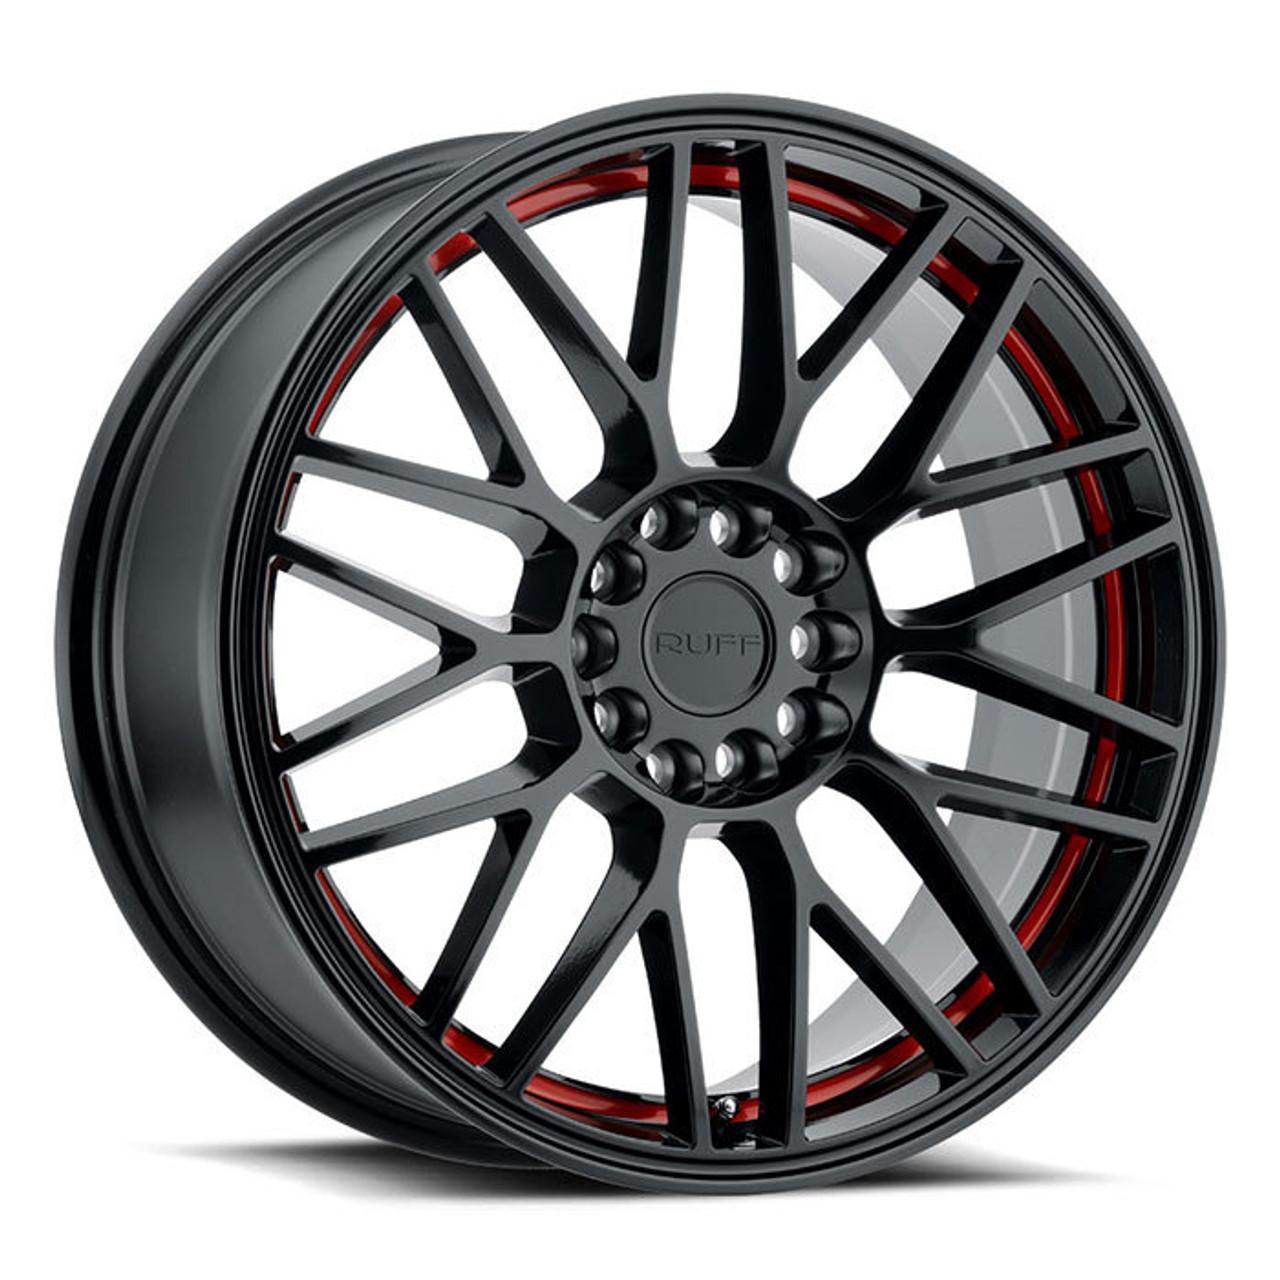 Ruff Wheels